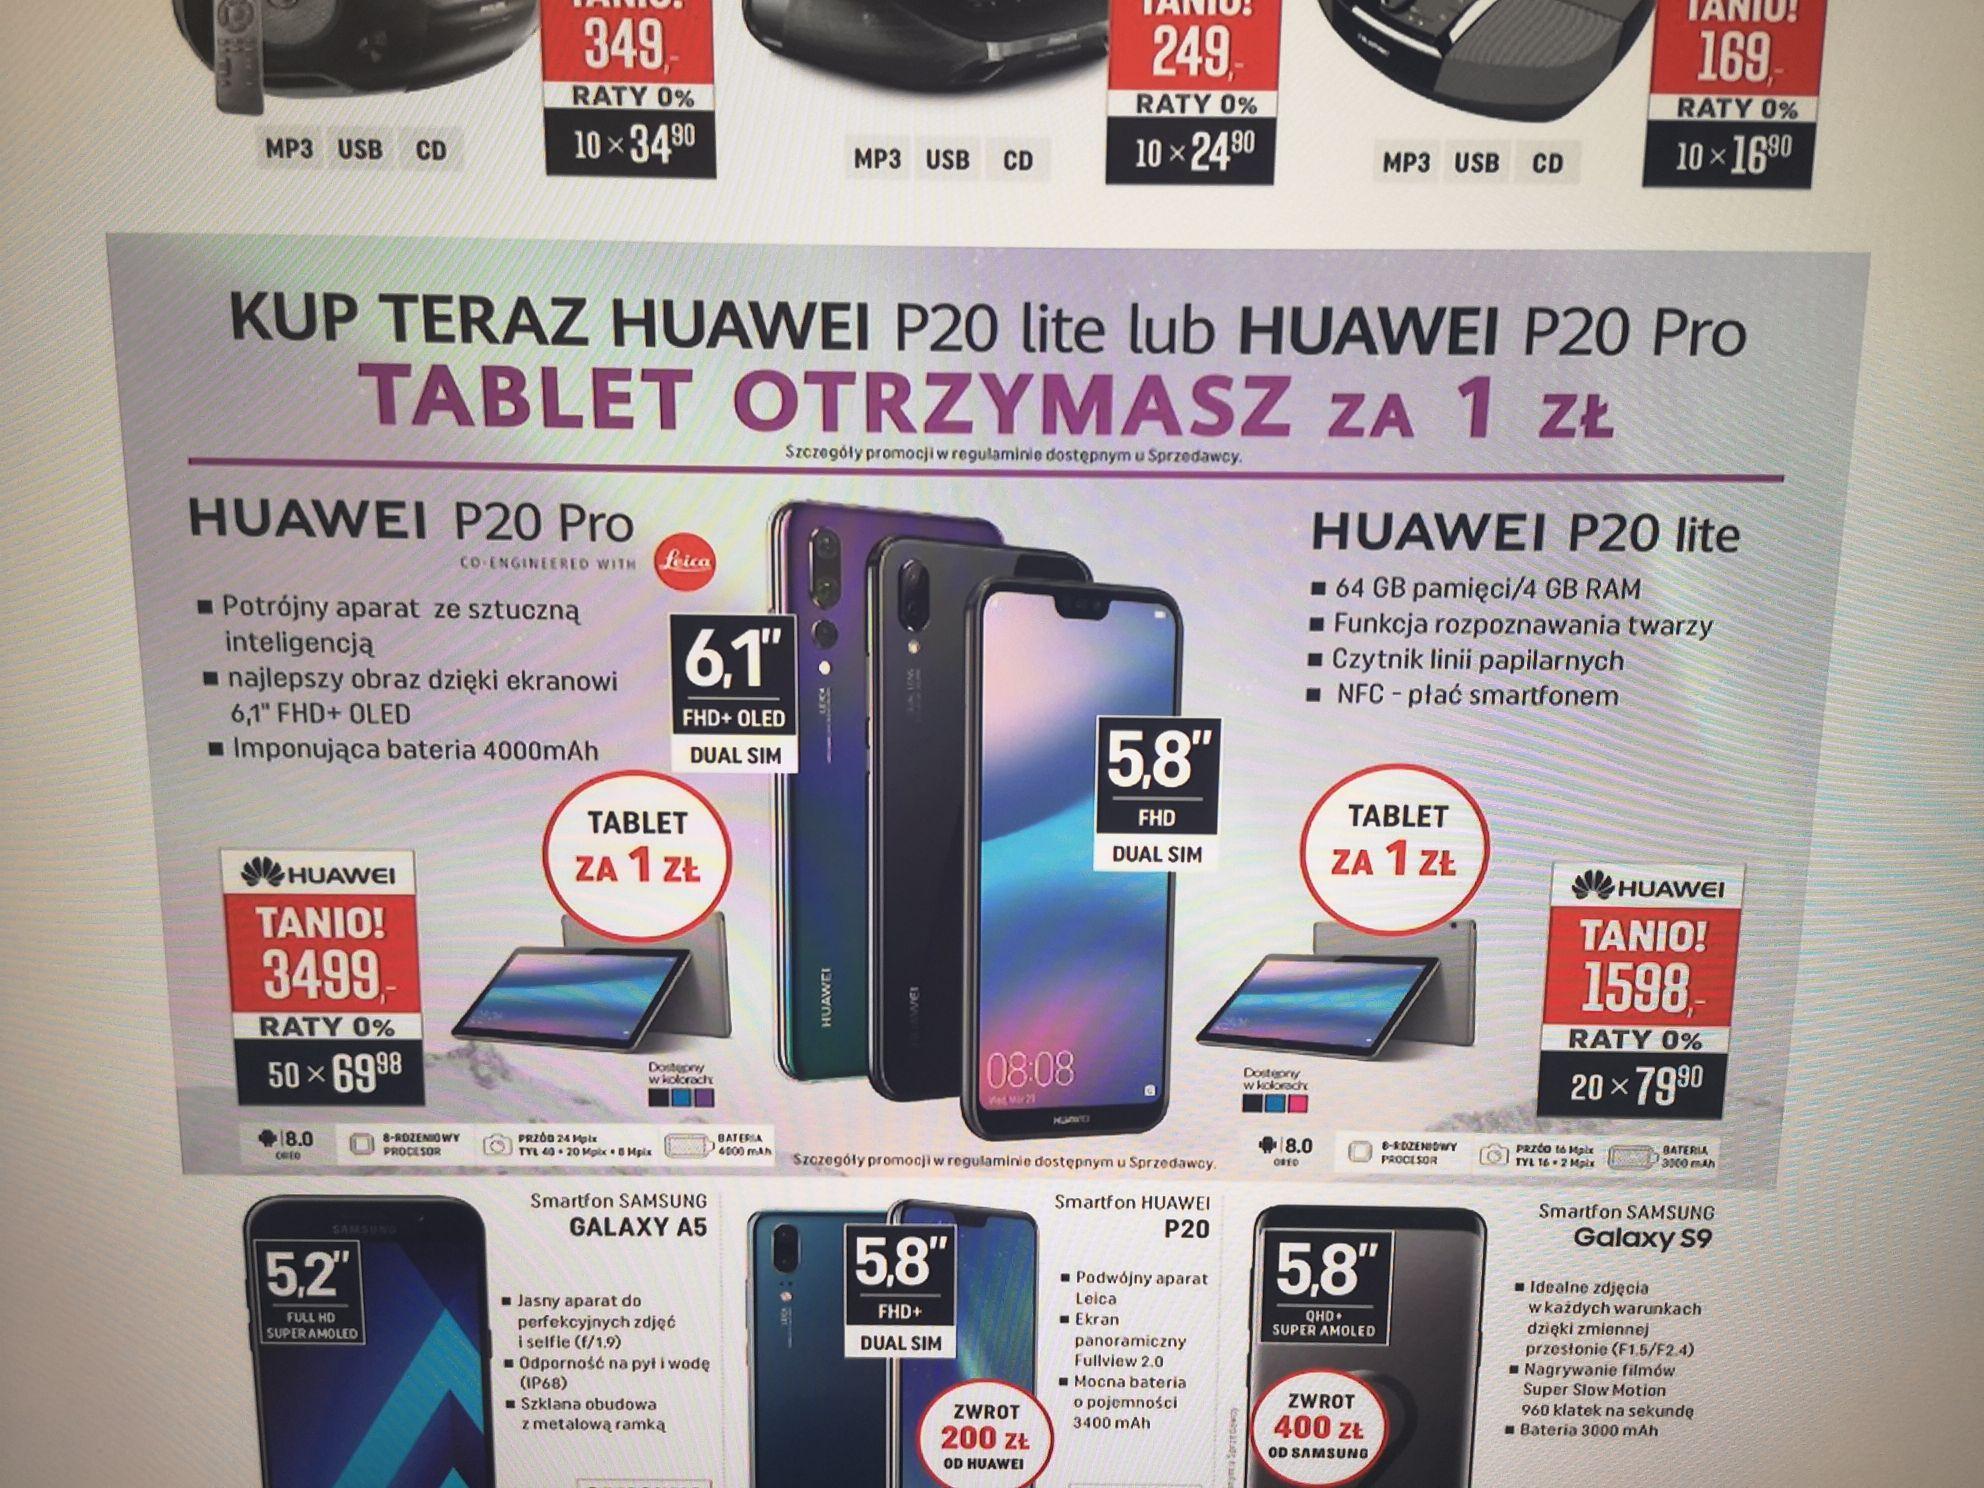 Huawei P20 PRO 128gb Dual Sim IP67 4000mAh OLED